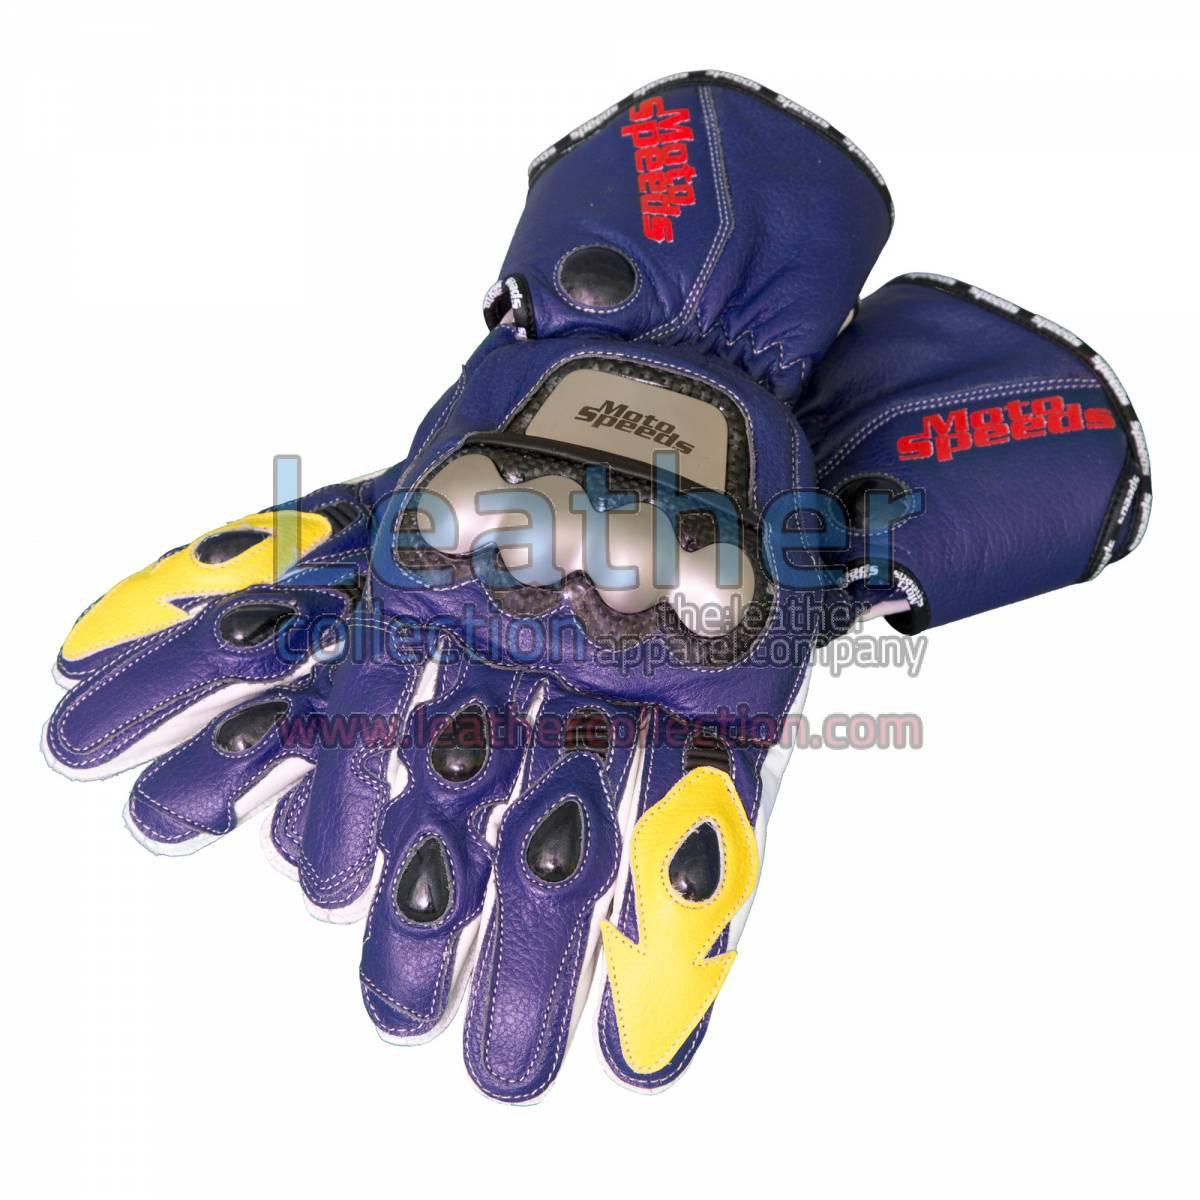 Chris Vermeulen Rizla Suzuki Race Gloves